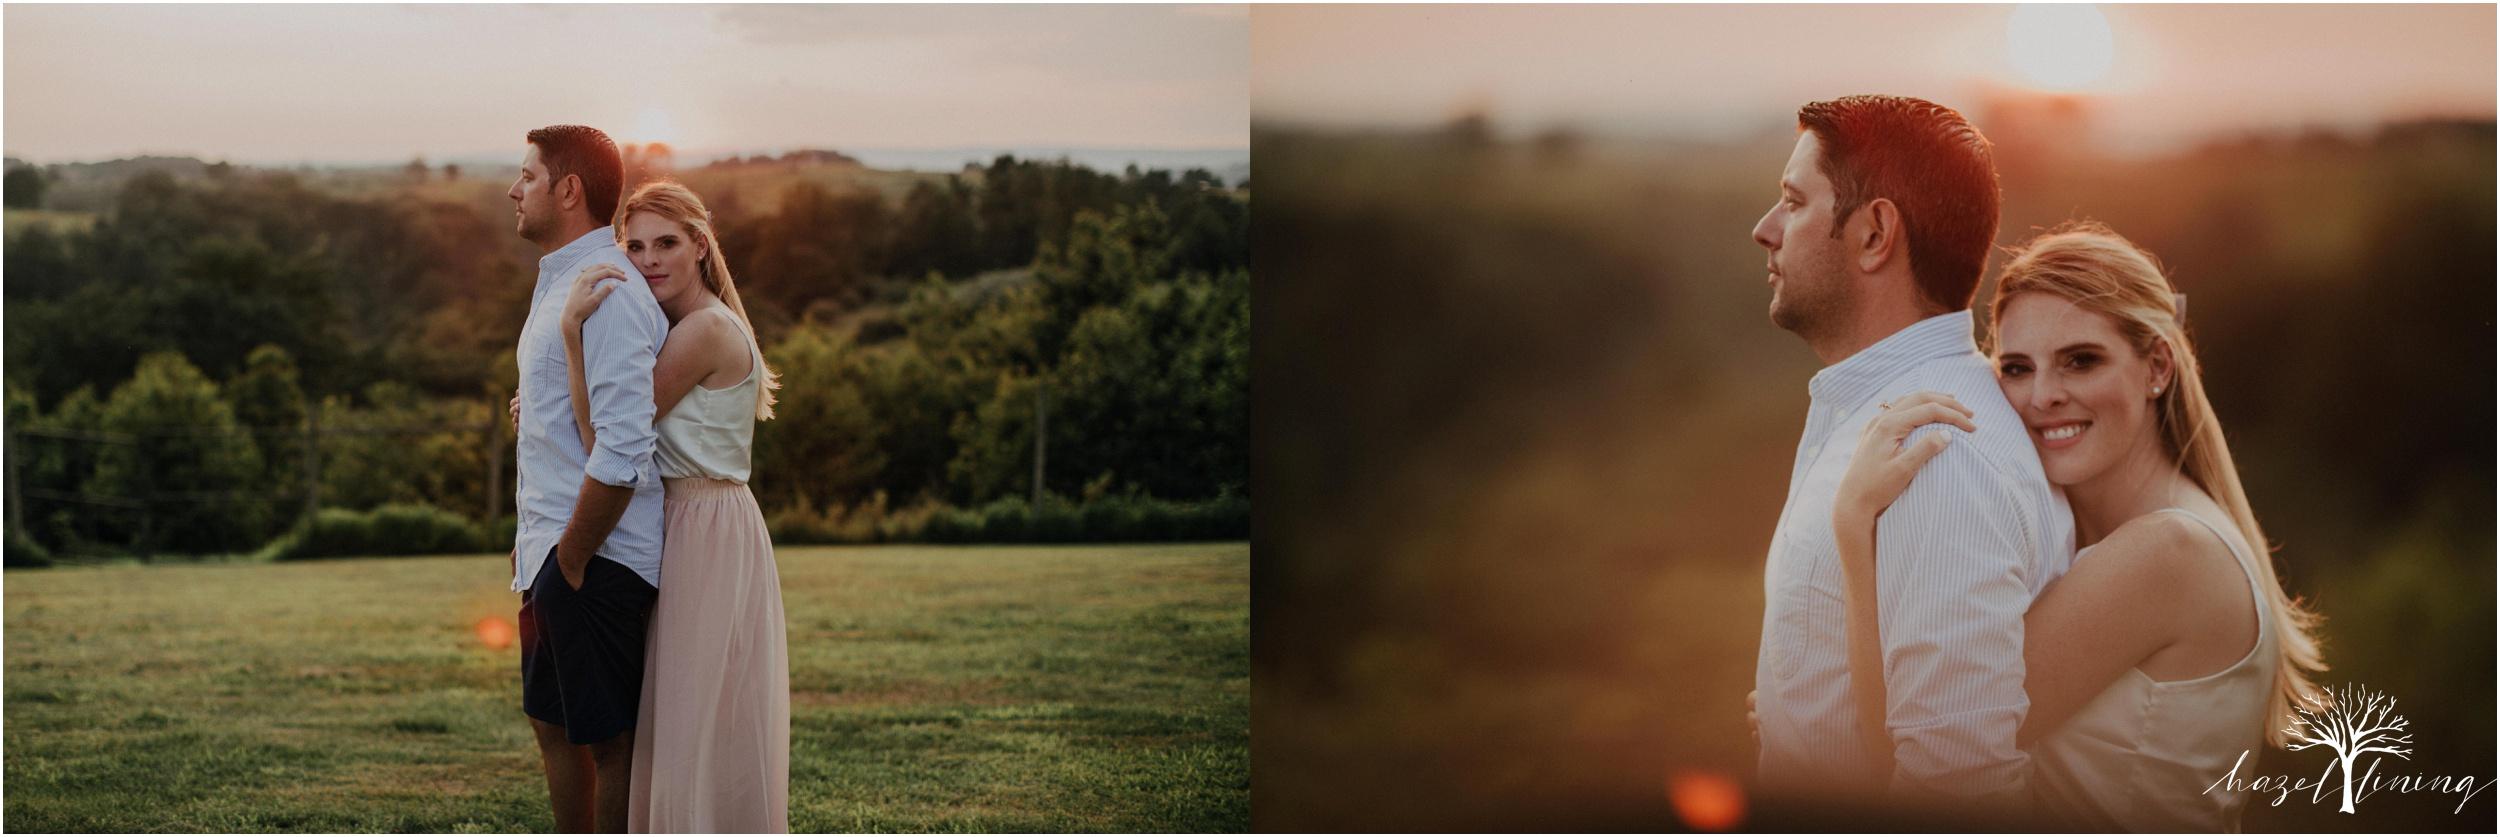 ashley-fillmore-steve-reimer-trexler-nature-preserve-summer-engagement-session-schnecksville-pennsylvania-hazel-lining-photography-destination-elopement-wedding-engagement-photography_0049.jpg